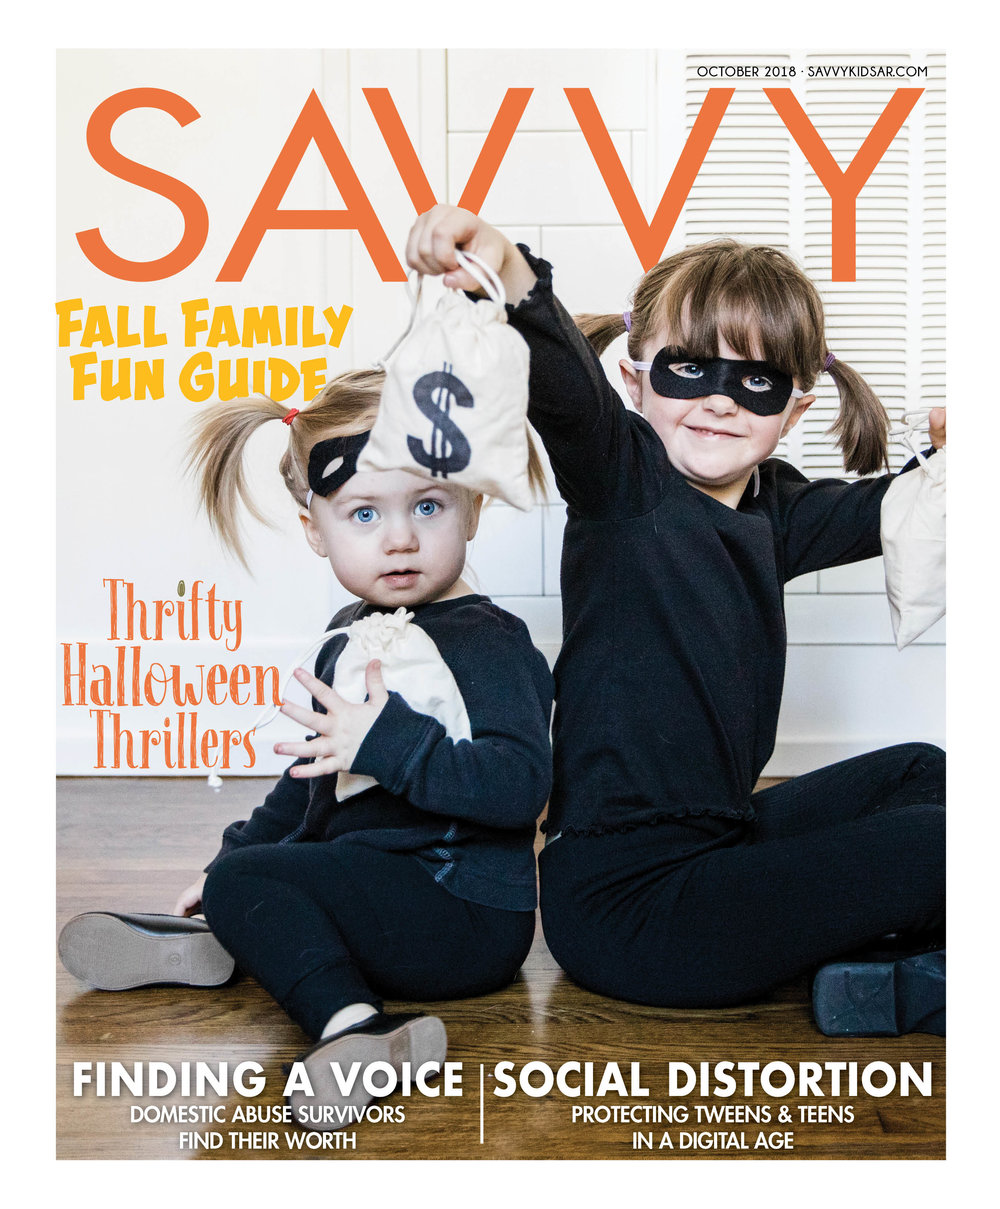 SAVVY October 2018 cover.jpg